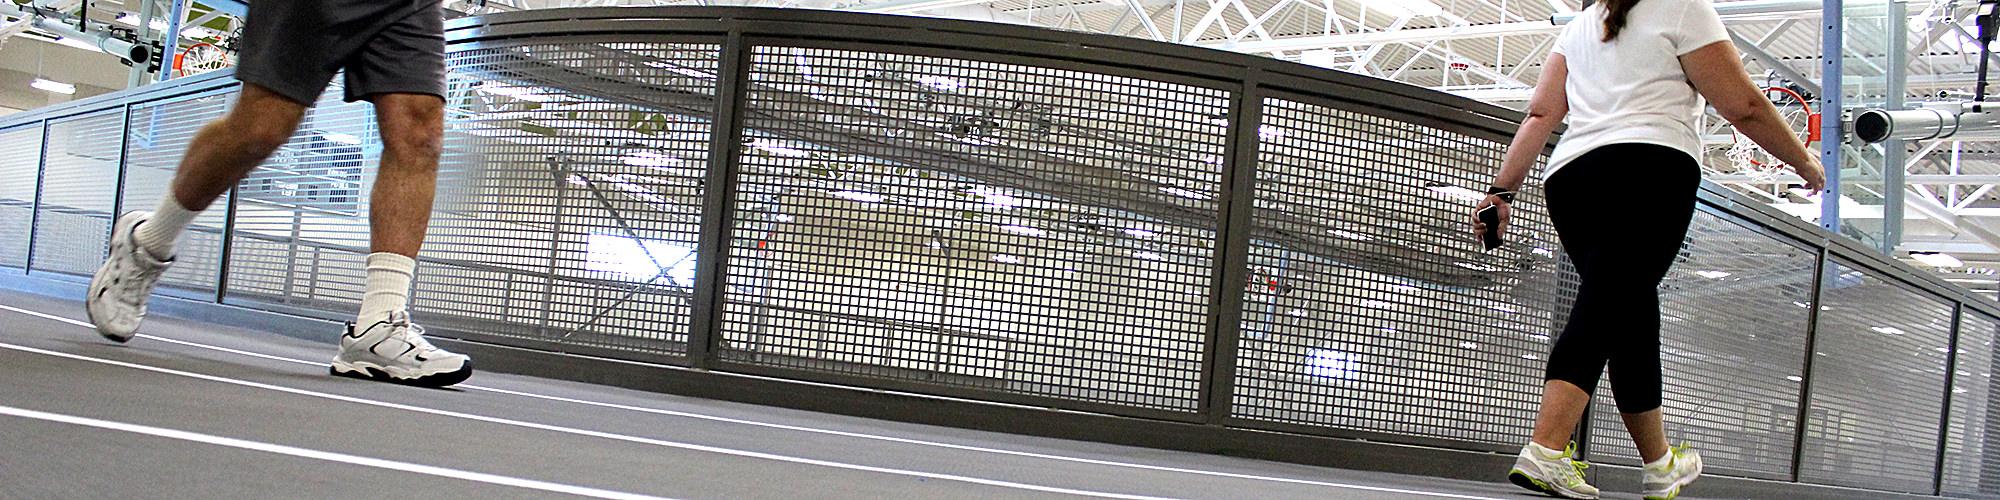 200x500-walkers-IMG_4690_mini